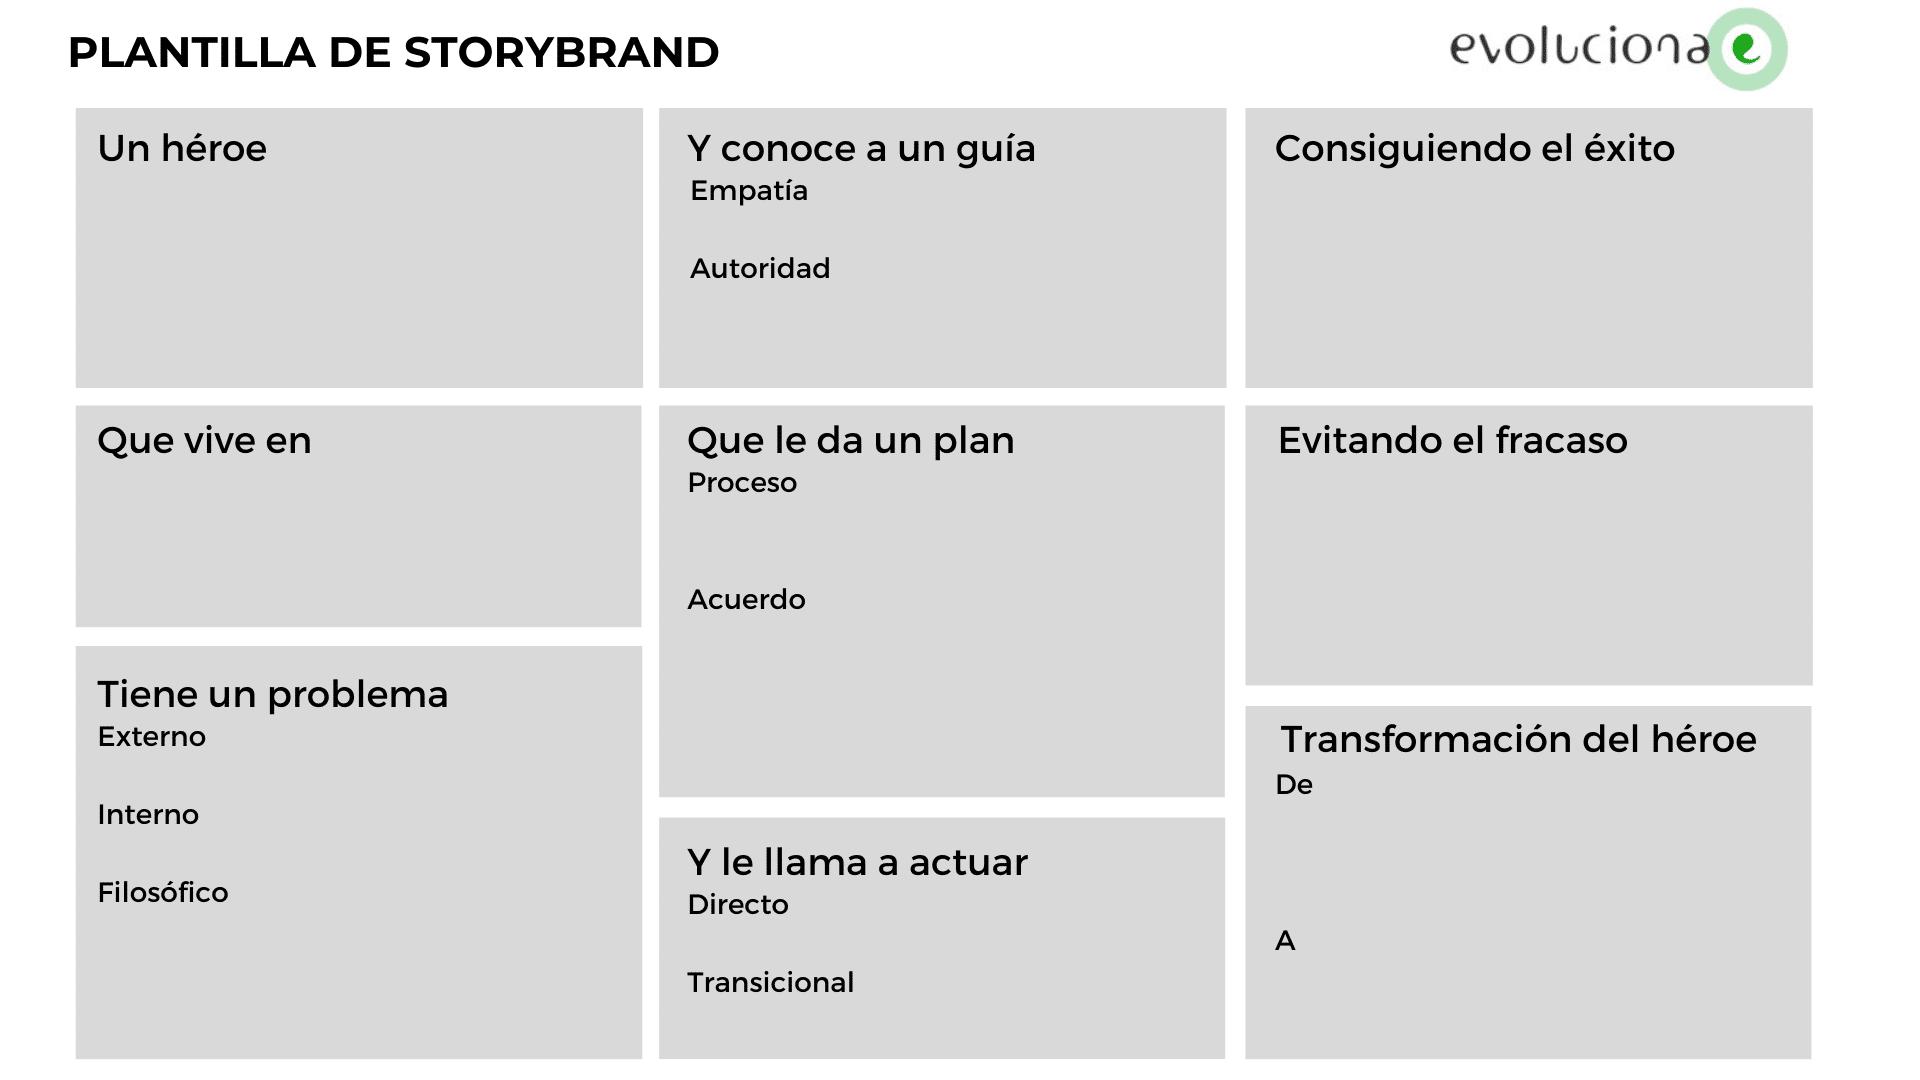 plantilla de Storybrand evoluciona